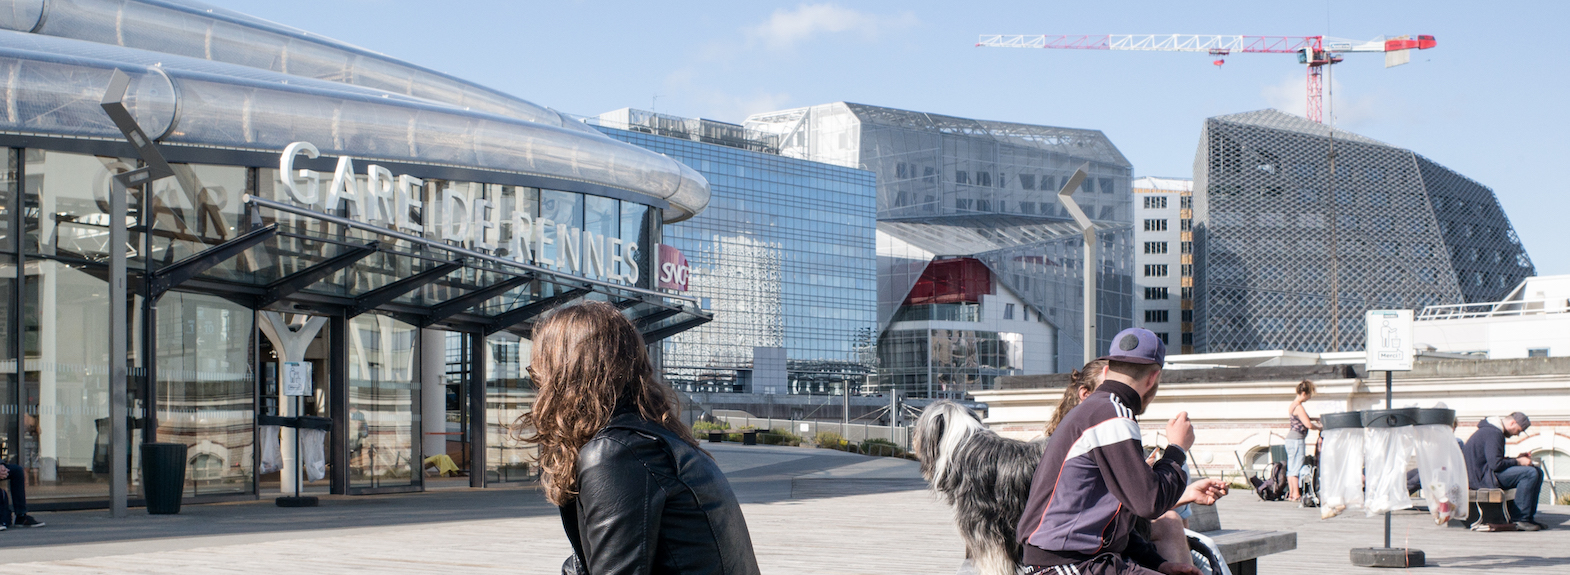 2-Eurorennes-Gare_terrasse_Nord-_juillet_aout_2019_HD.jpg